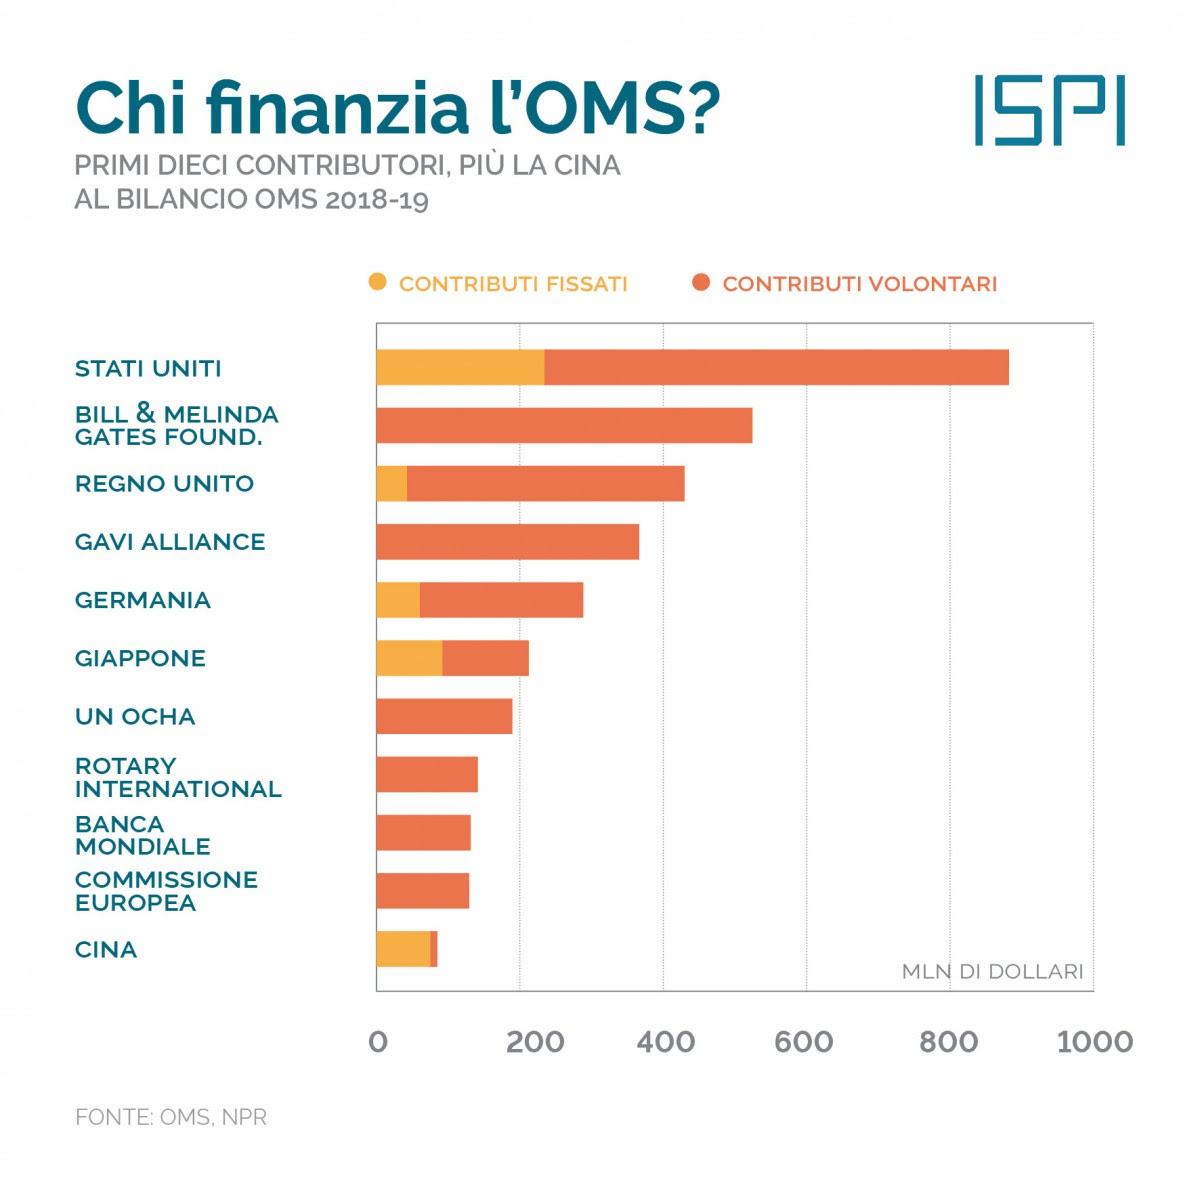 https://campaign-image.eu/zohocampaigns/28716000026512985_zc_v6_chi_finanzia_oms.jpg